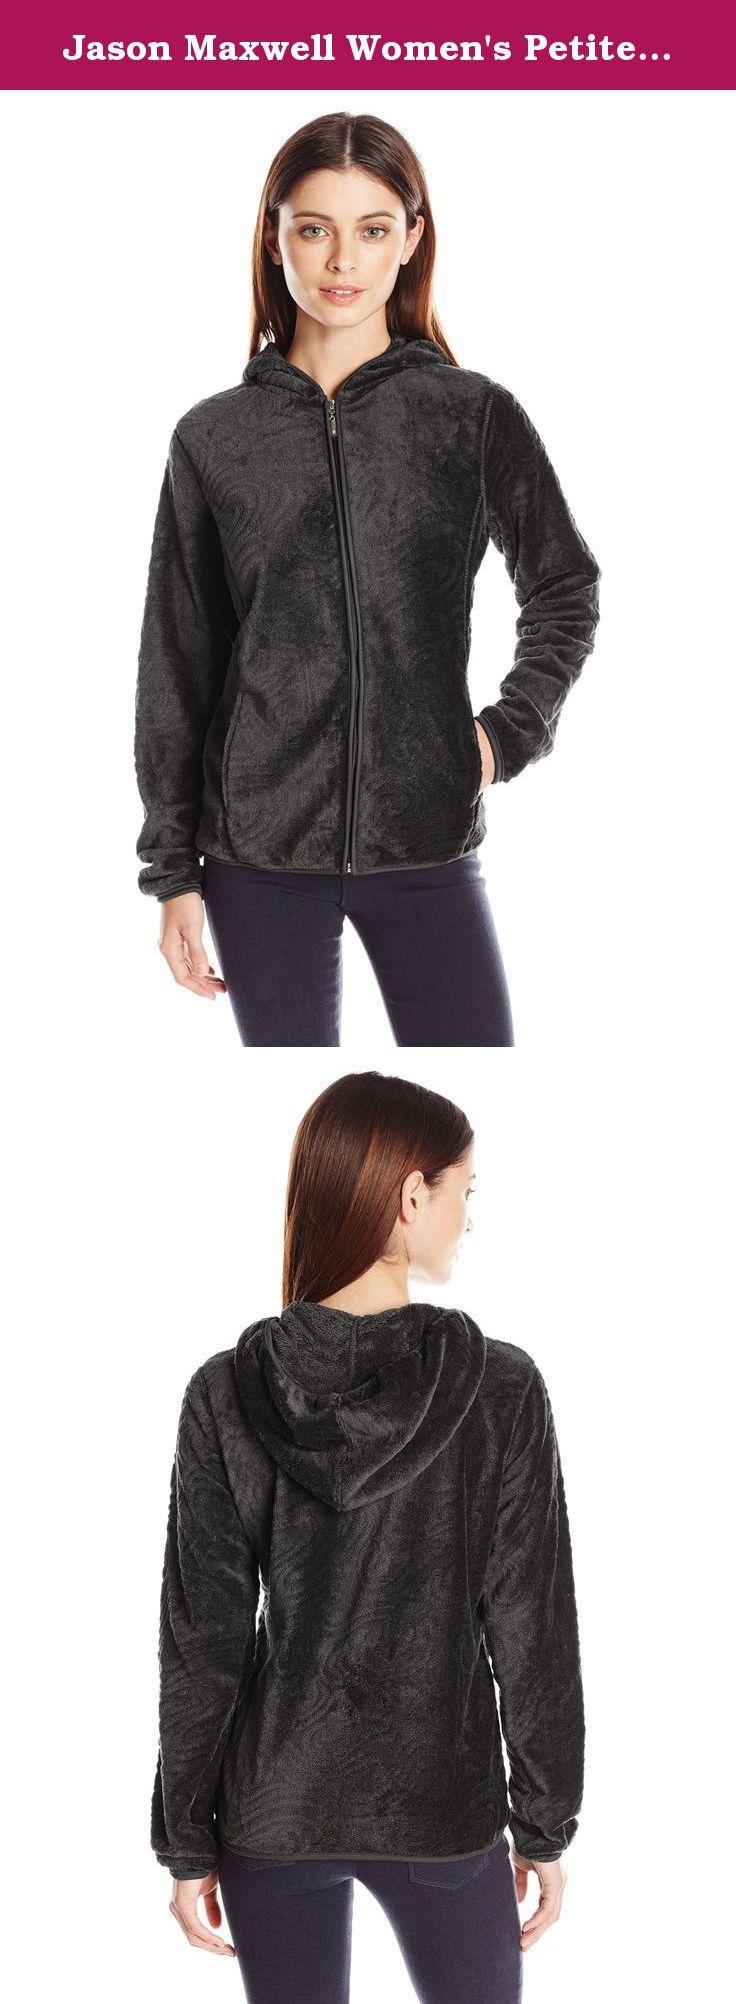 Jason Maxwell Women's Petite Patterned Textured Hooded Fleece Jacket, Caviar, Petite/X-Large. Full zip textured hoodie fleece jacket with princess seams.